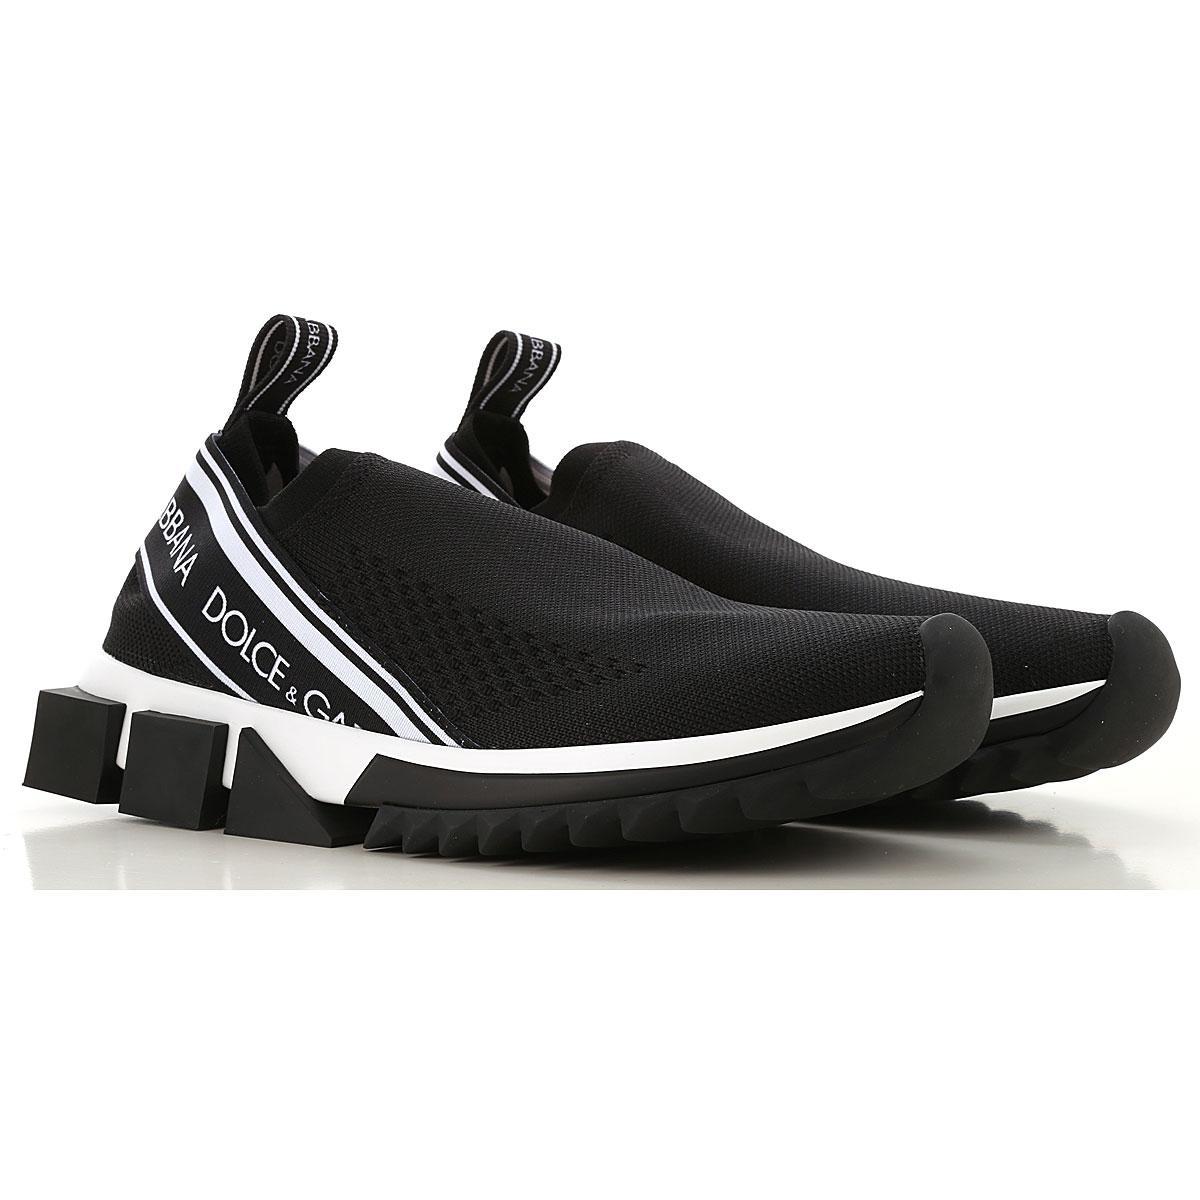 2d4614d64a Dolce & Gabbana - Black Zapatillas Deportivas de Mujer - Lyst. Ver en  pantalla completa